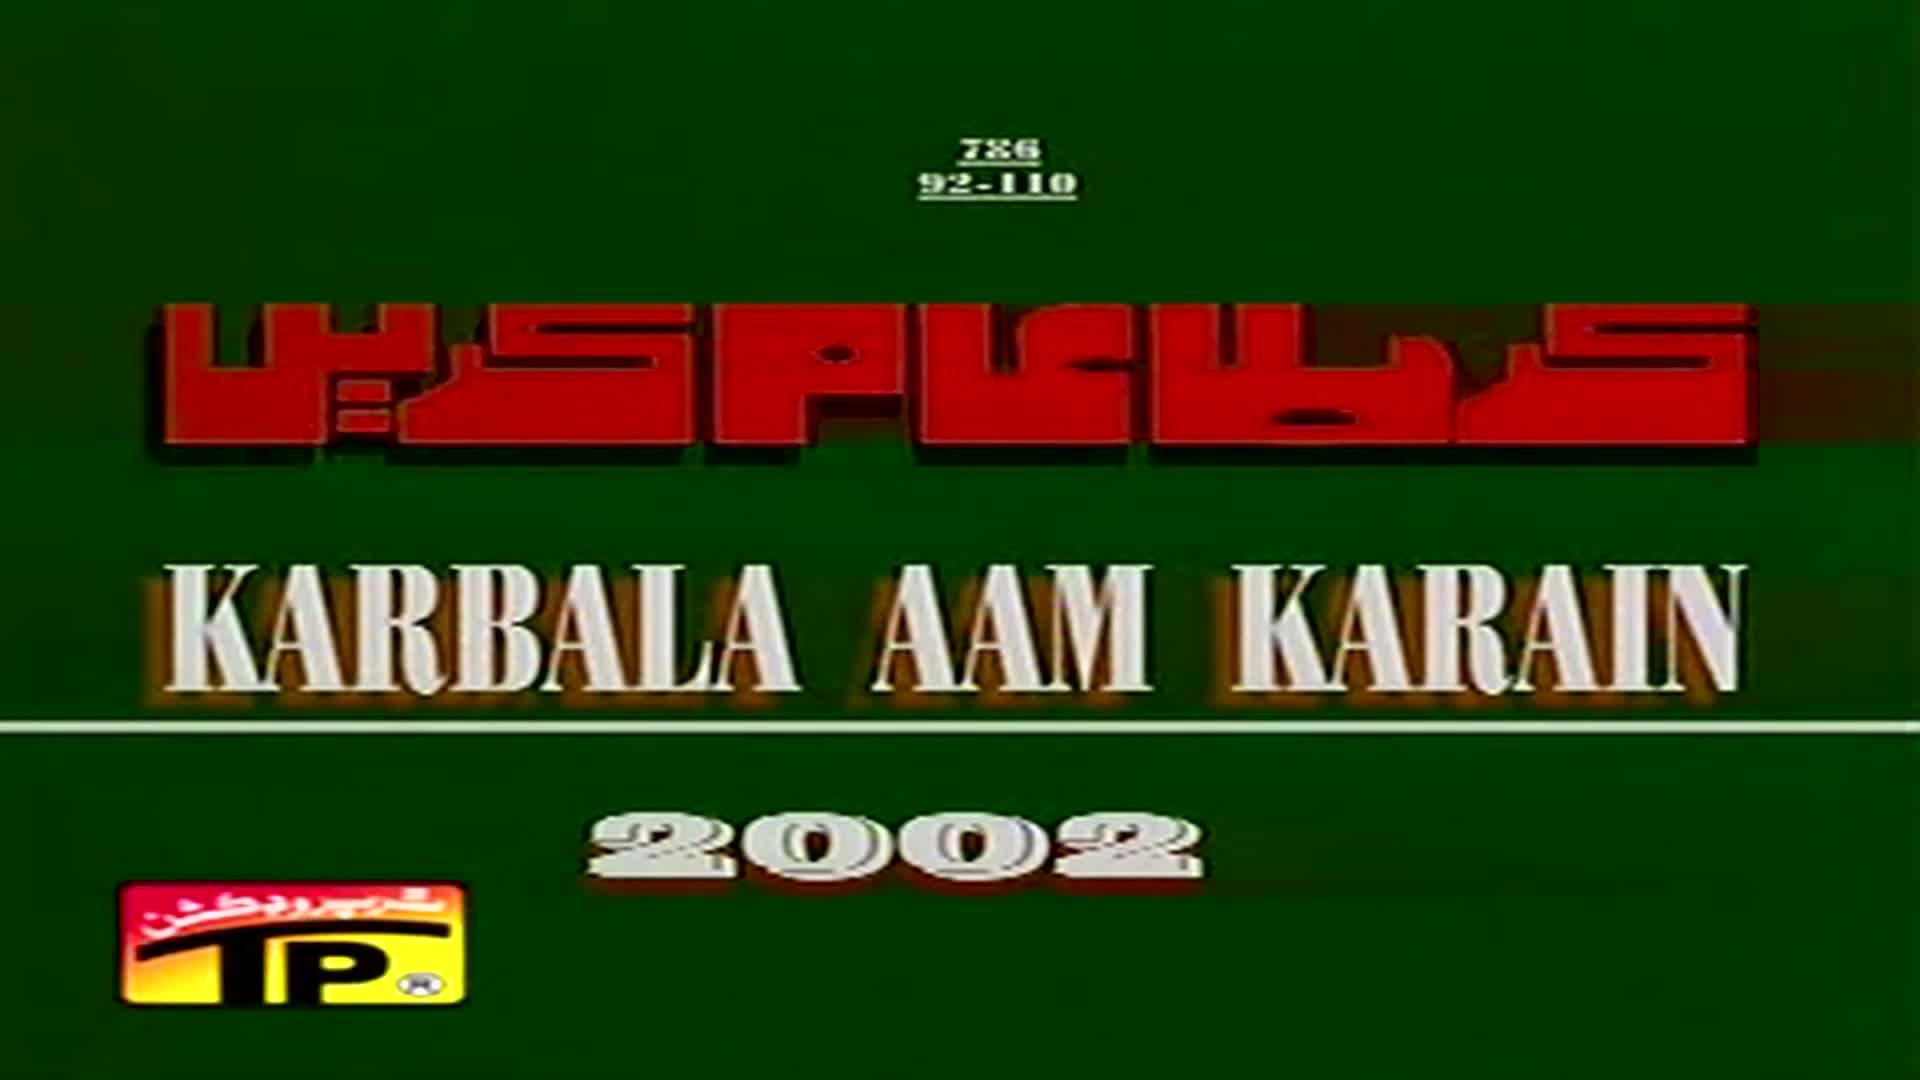 Karbala Aam Karein